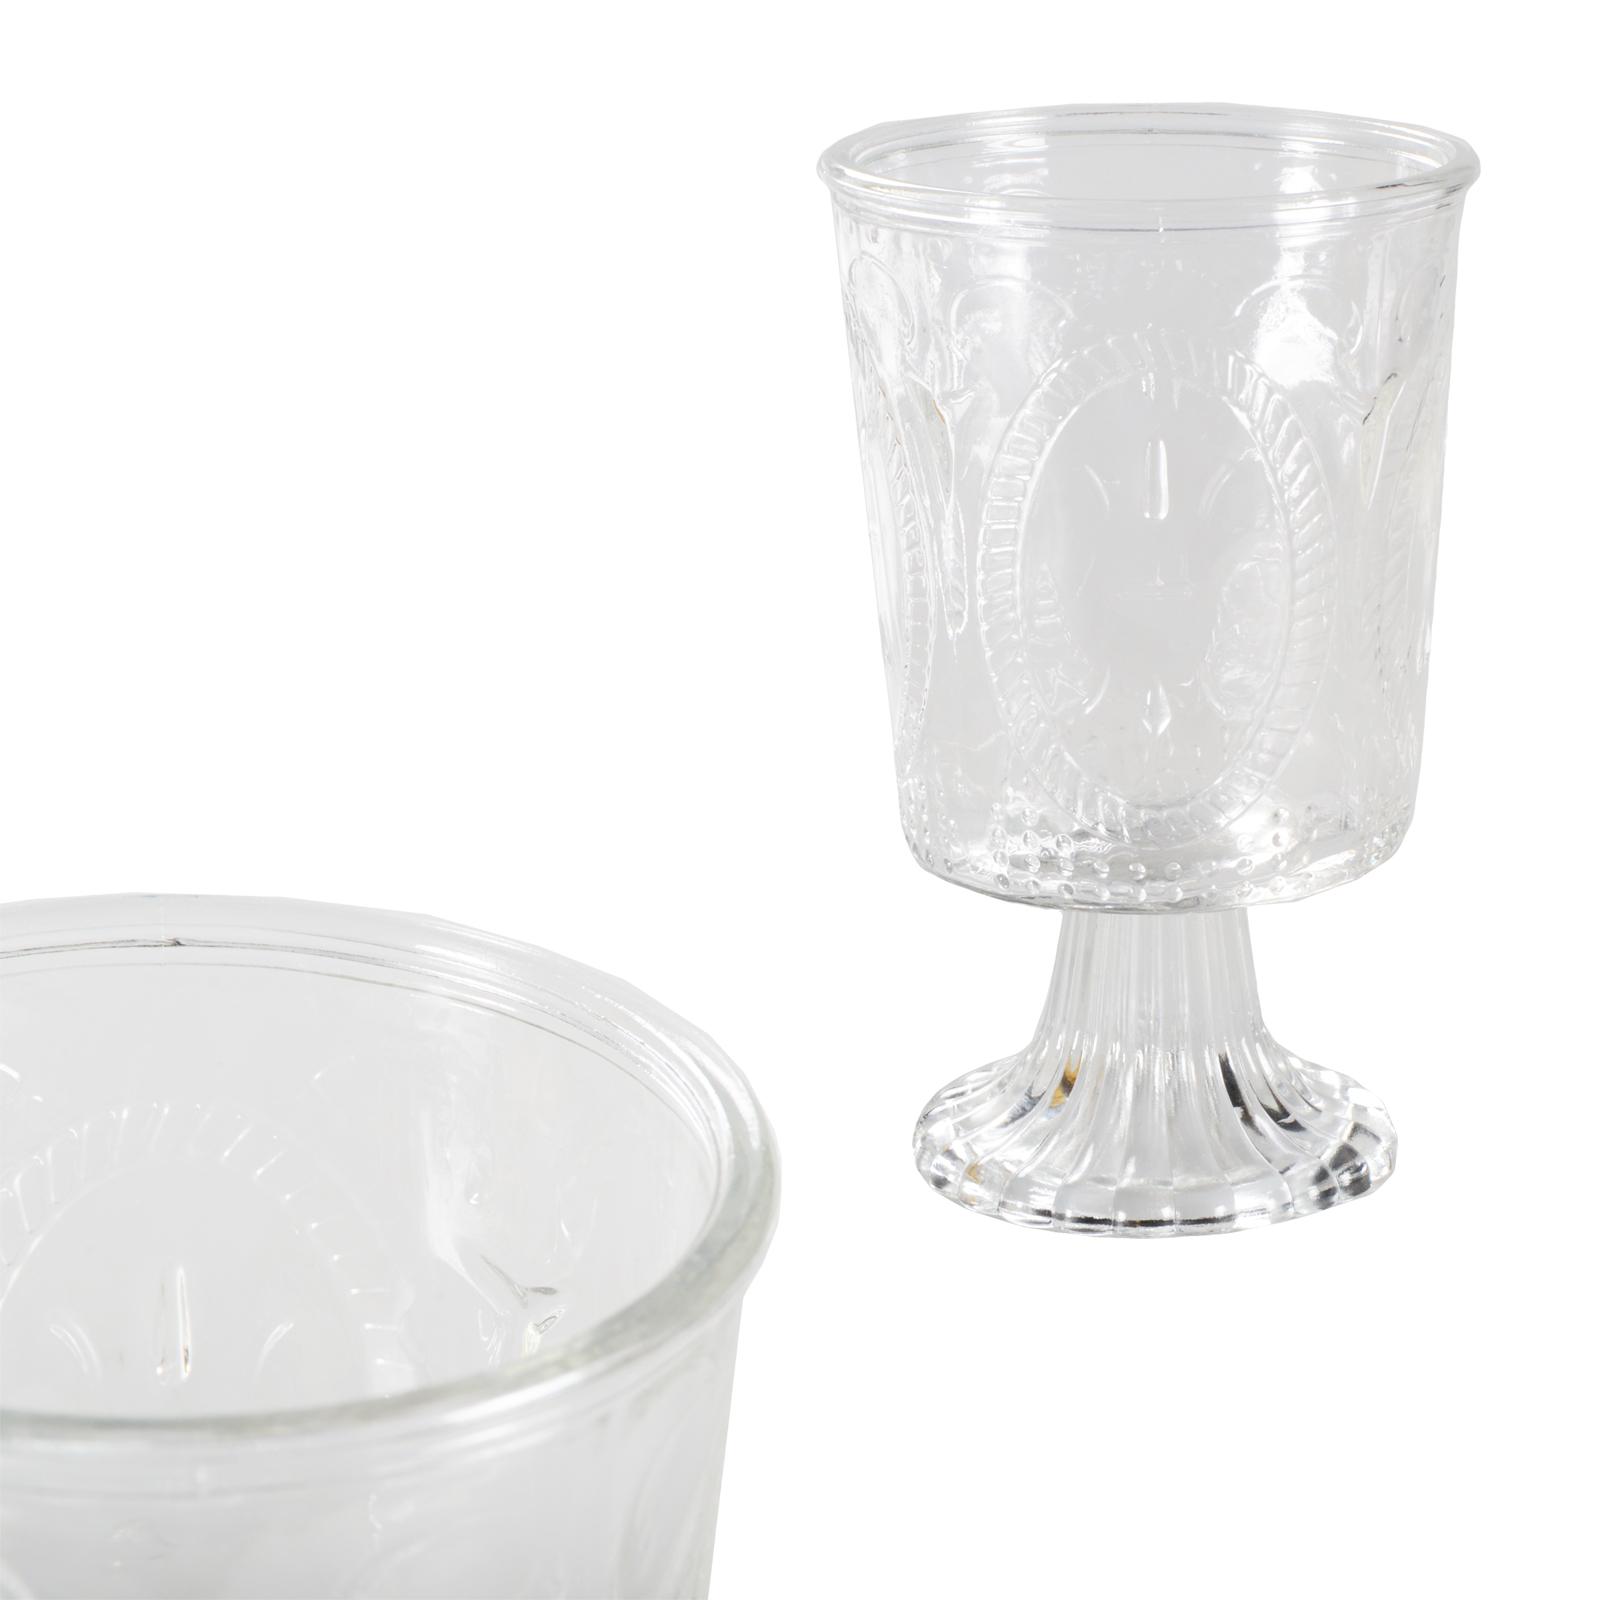 Glasvase haven glas vase blumenvase dekovase blumentopf for Blumentopf glas